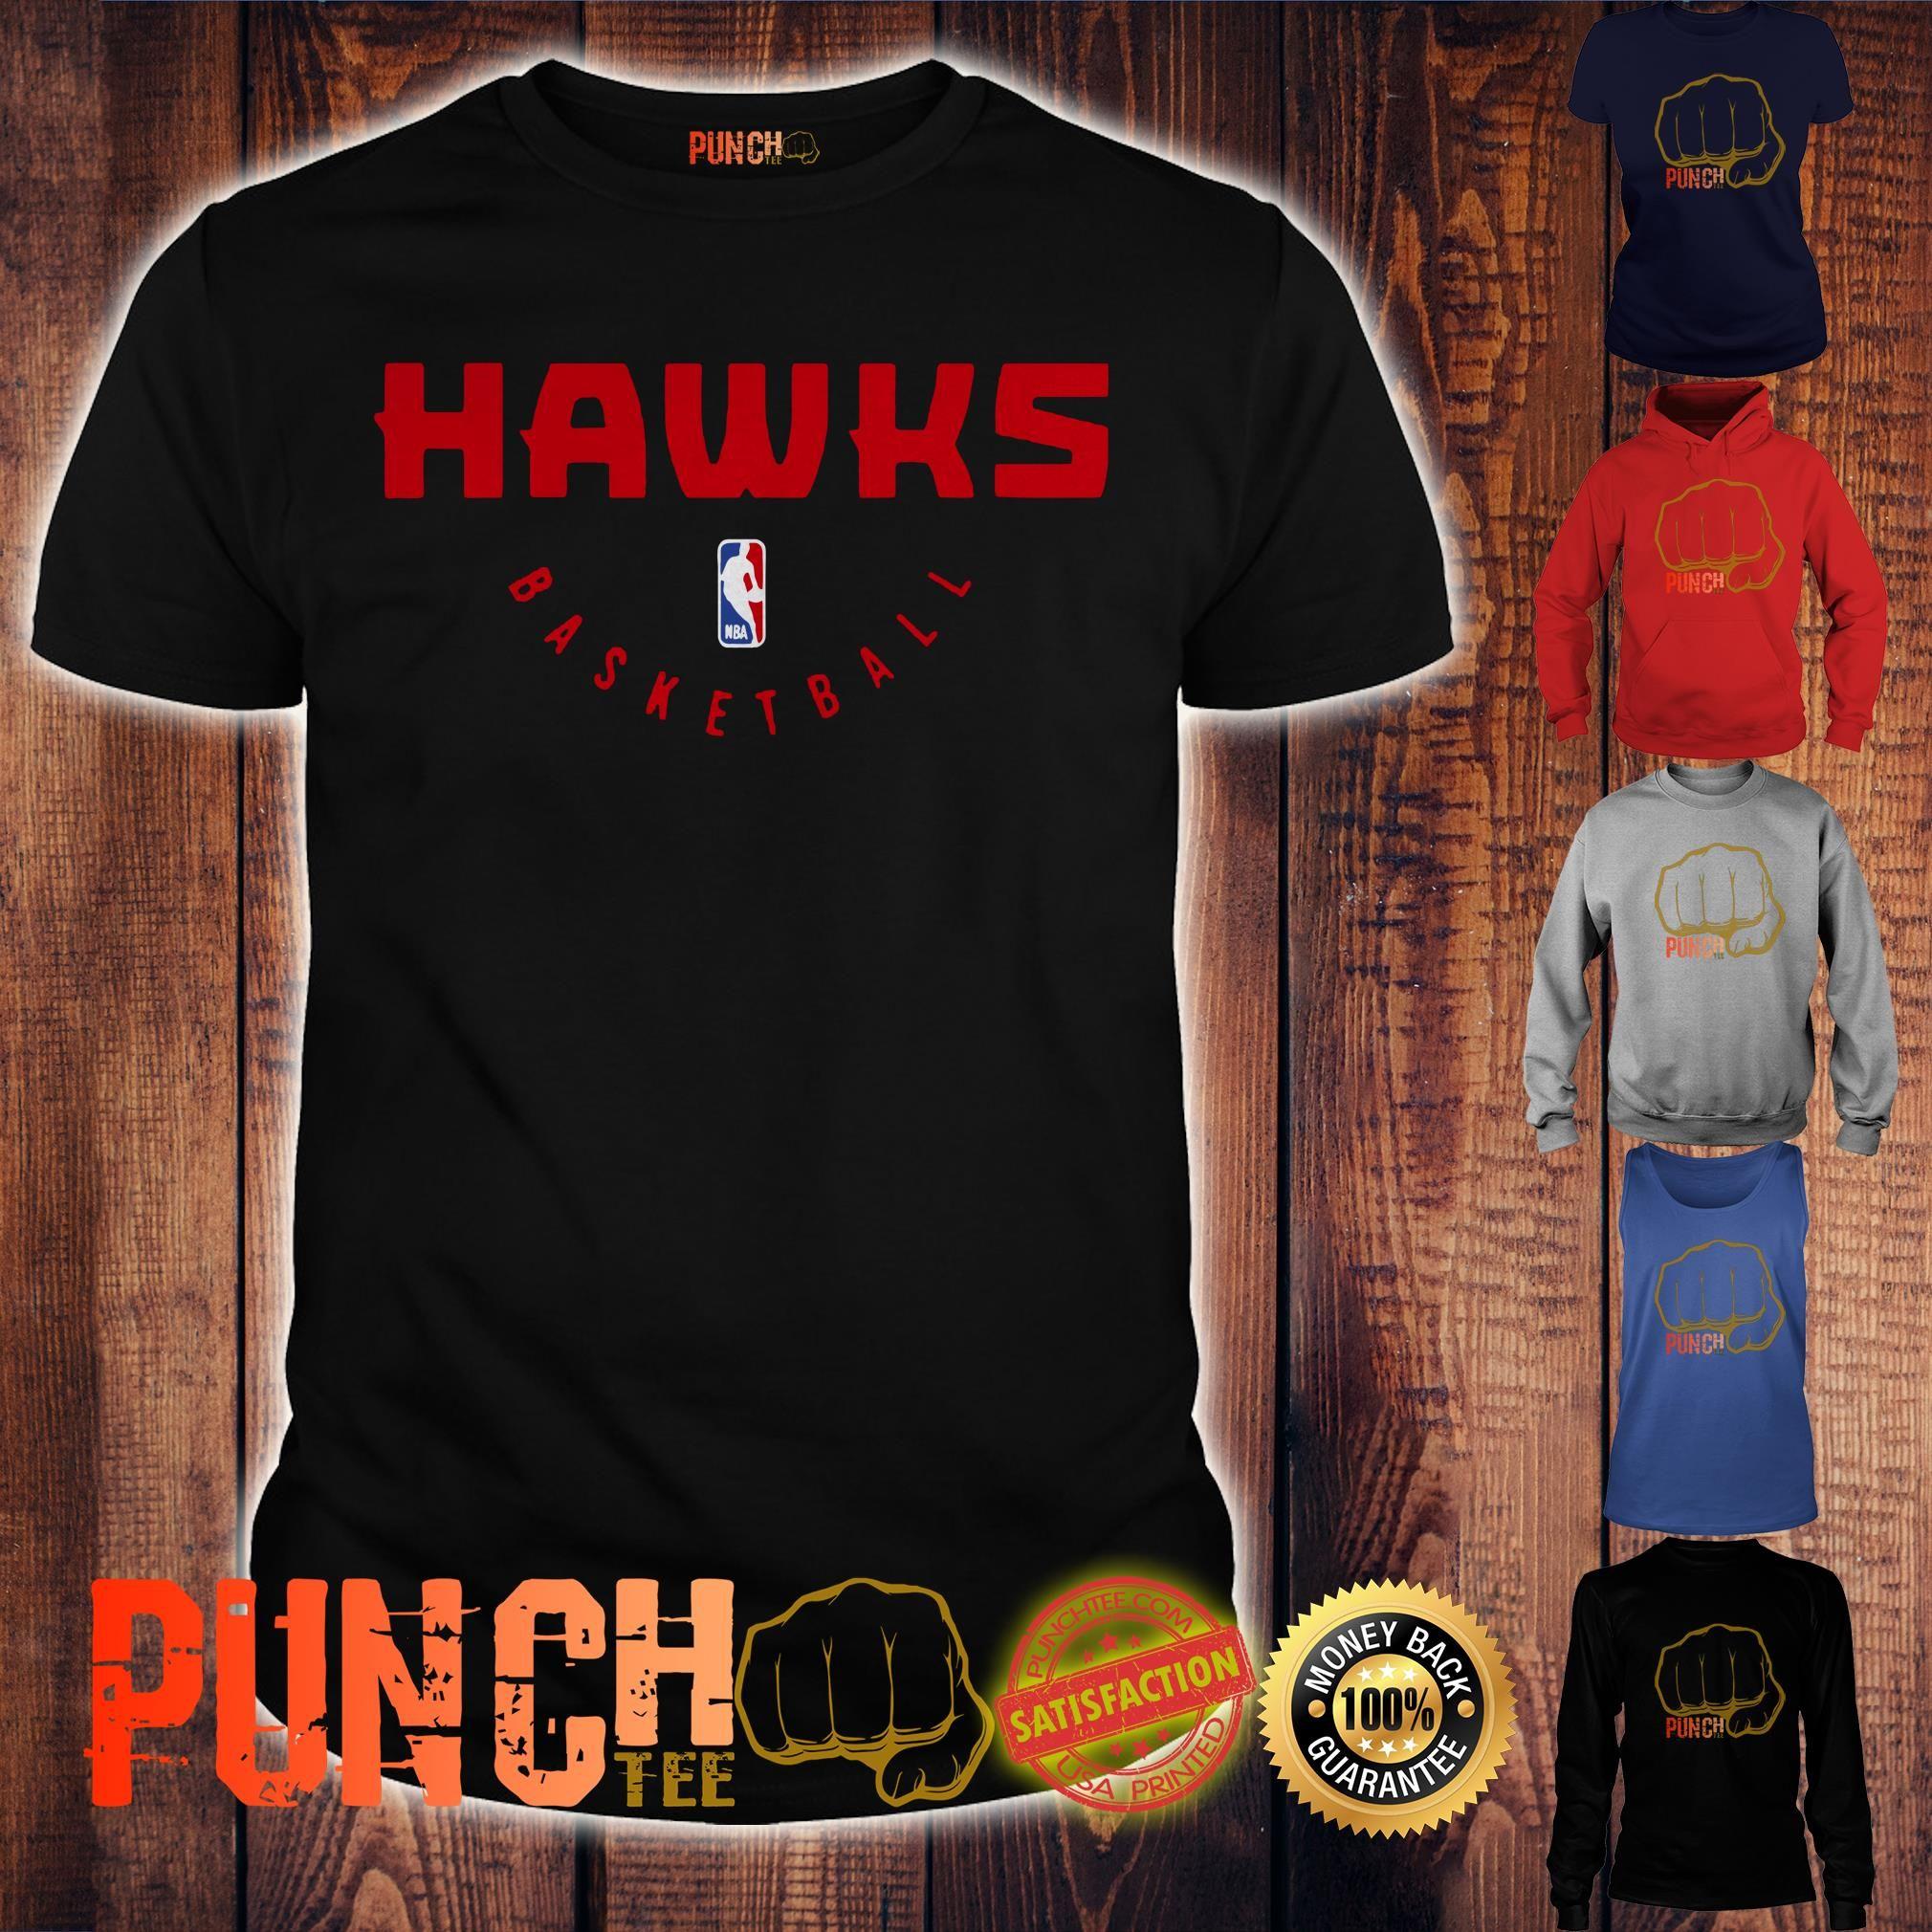 (Free shipping) Atlanta Hawks Basketball NBA 2019 shirt